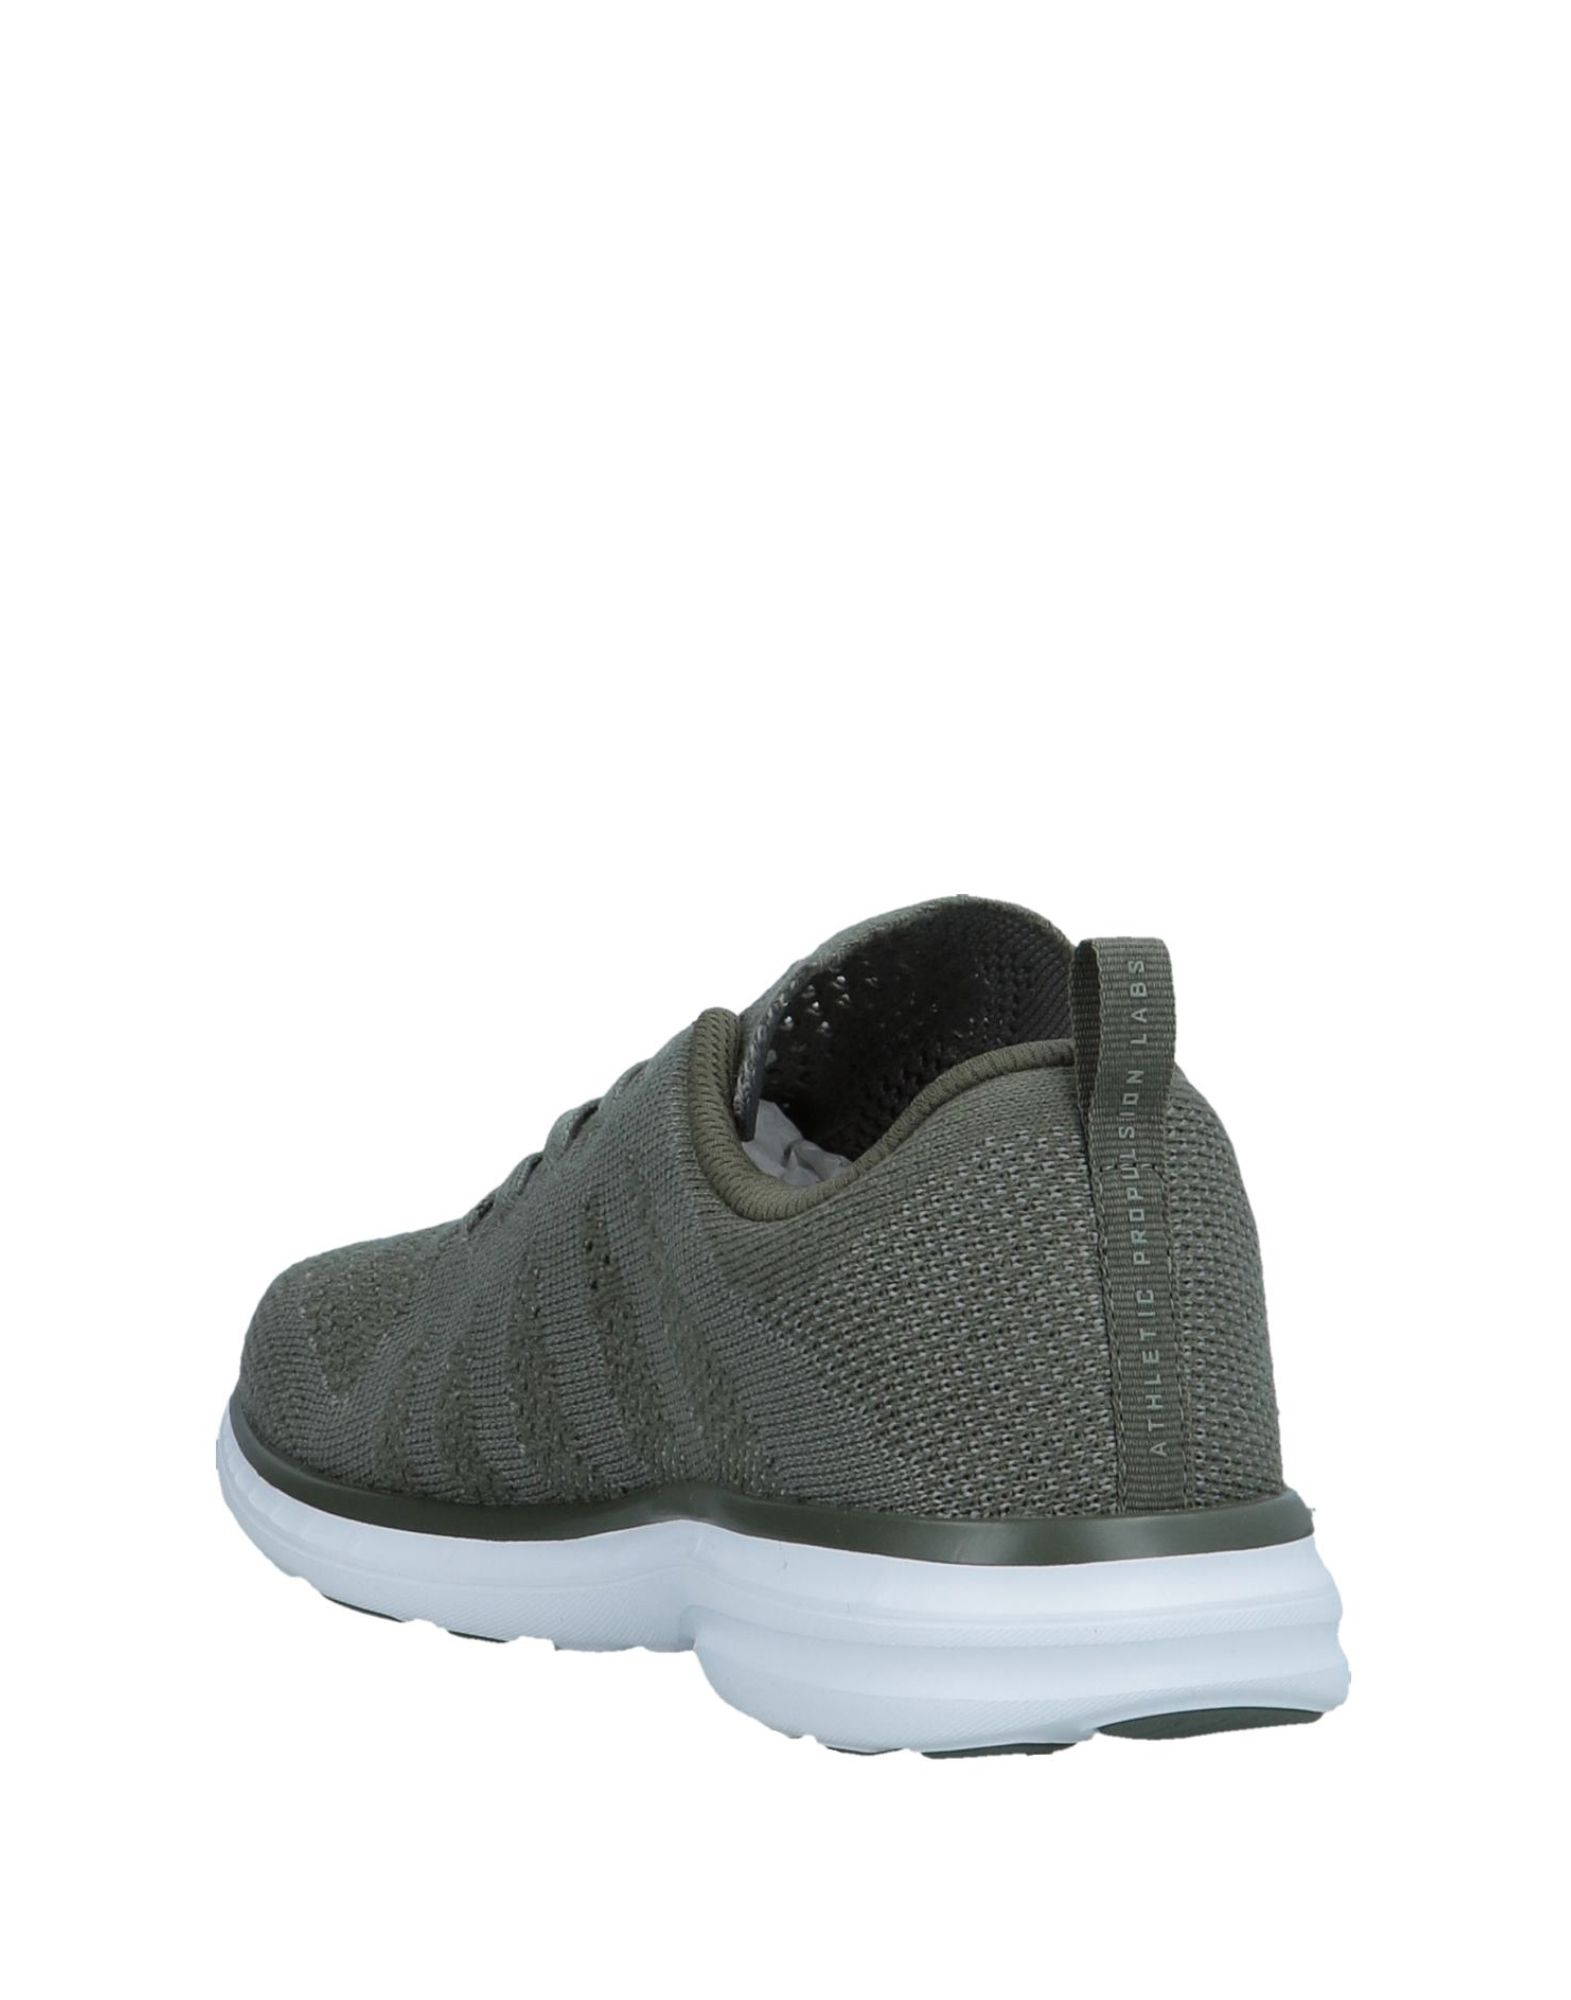 Apl® Athletic Propulsion Qualität Labs Sneakers Herren  11558464MJ Gute Qualität Propulsion beliebte Schuhe 27bd11